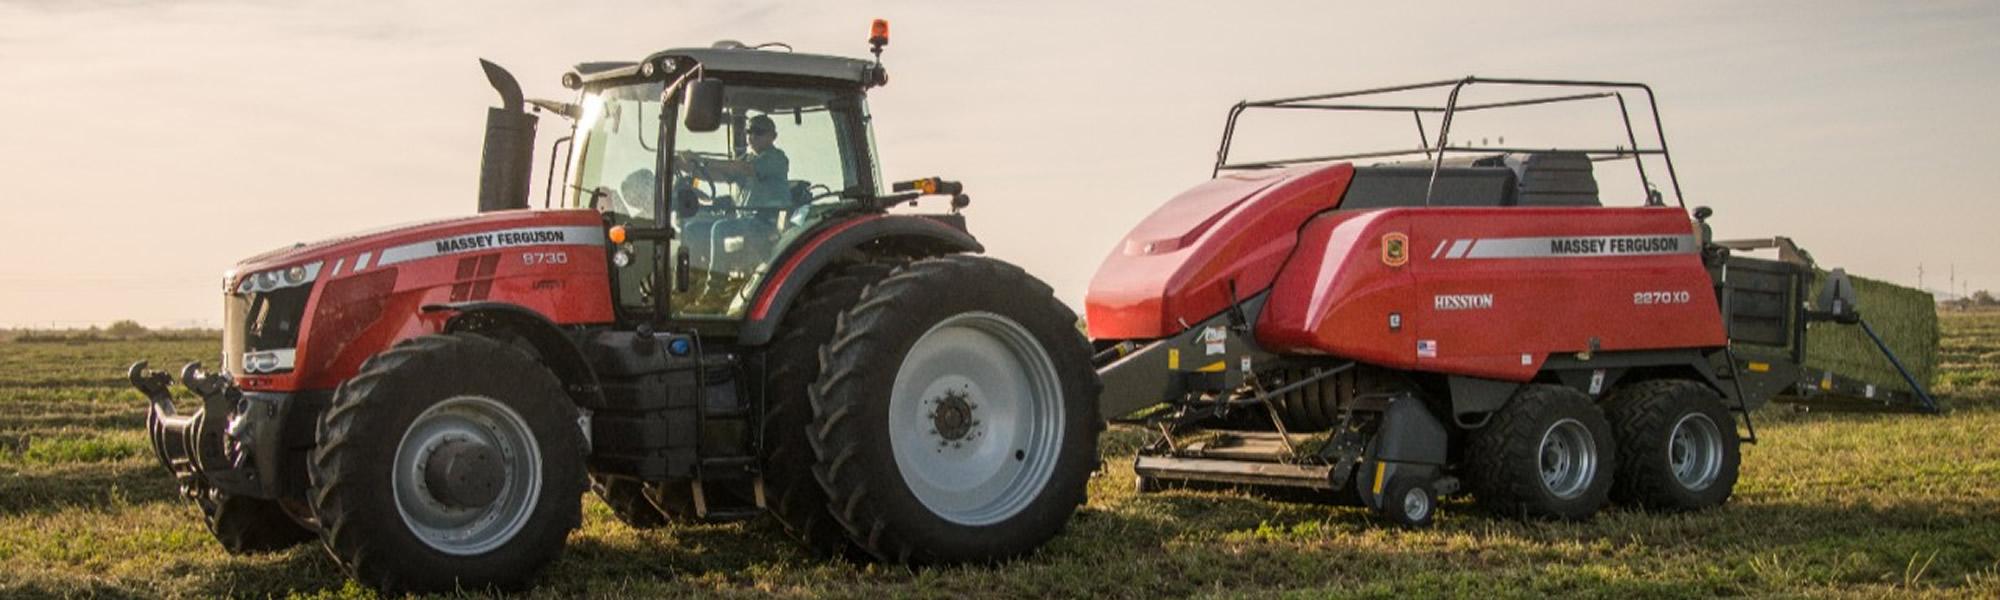 Lodermeiers Implement and Farm Equipment